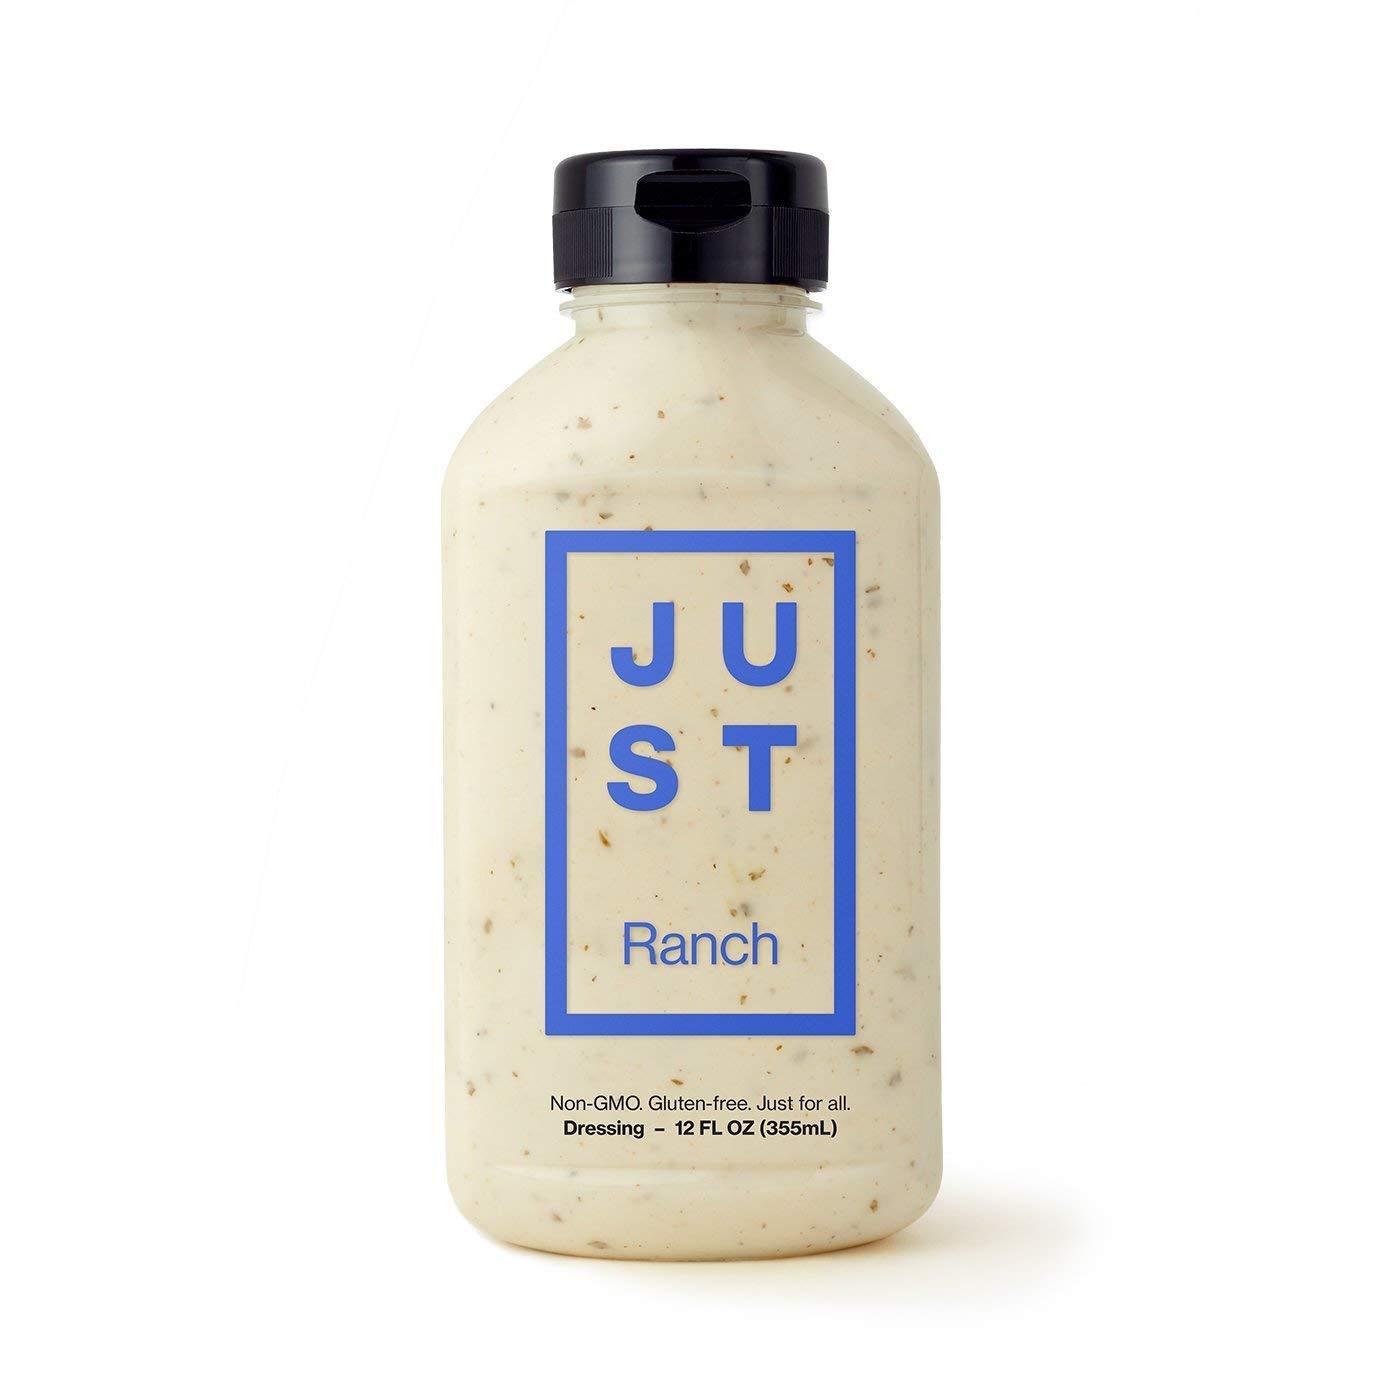 just, the best vegan ranch alternative